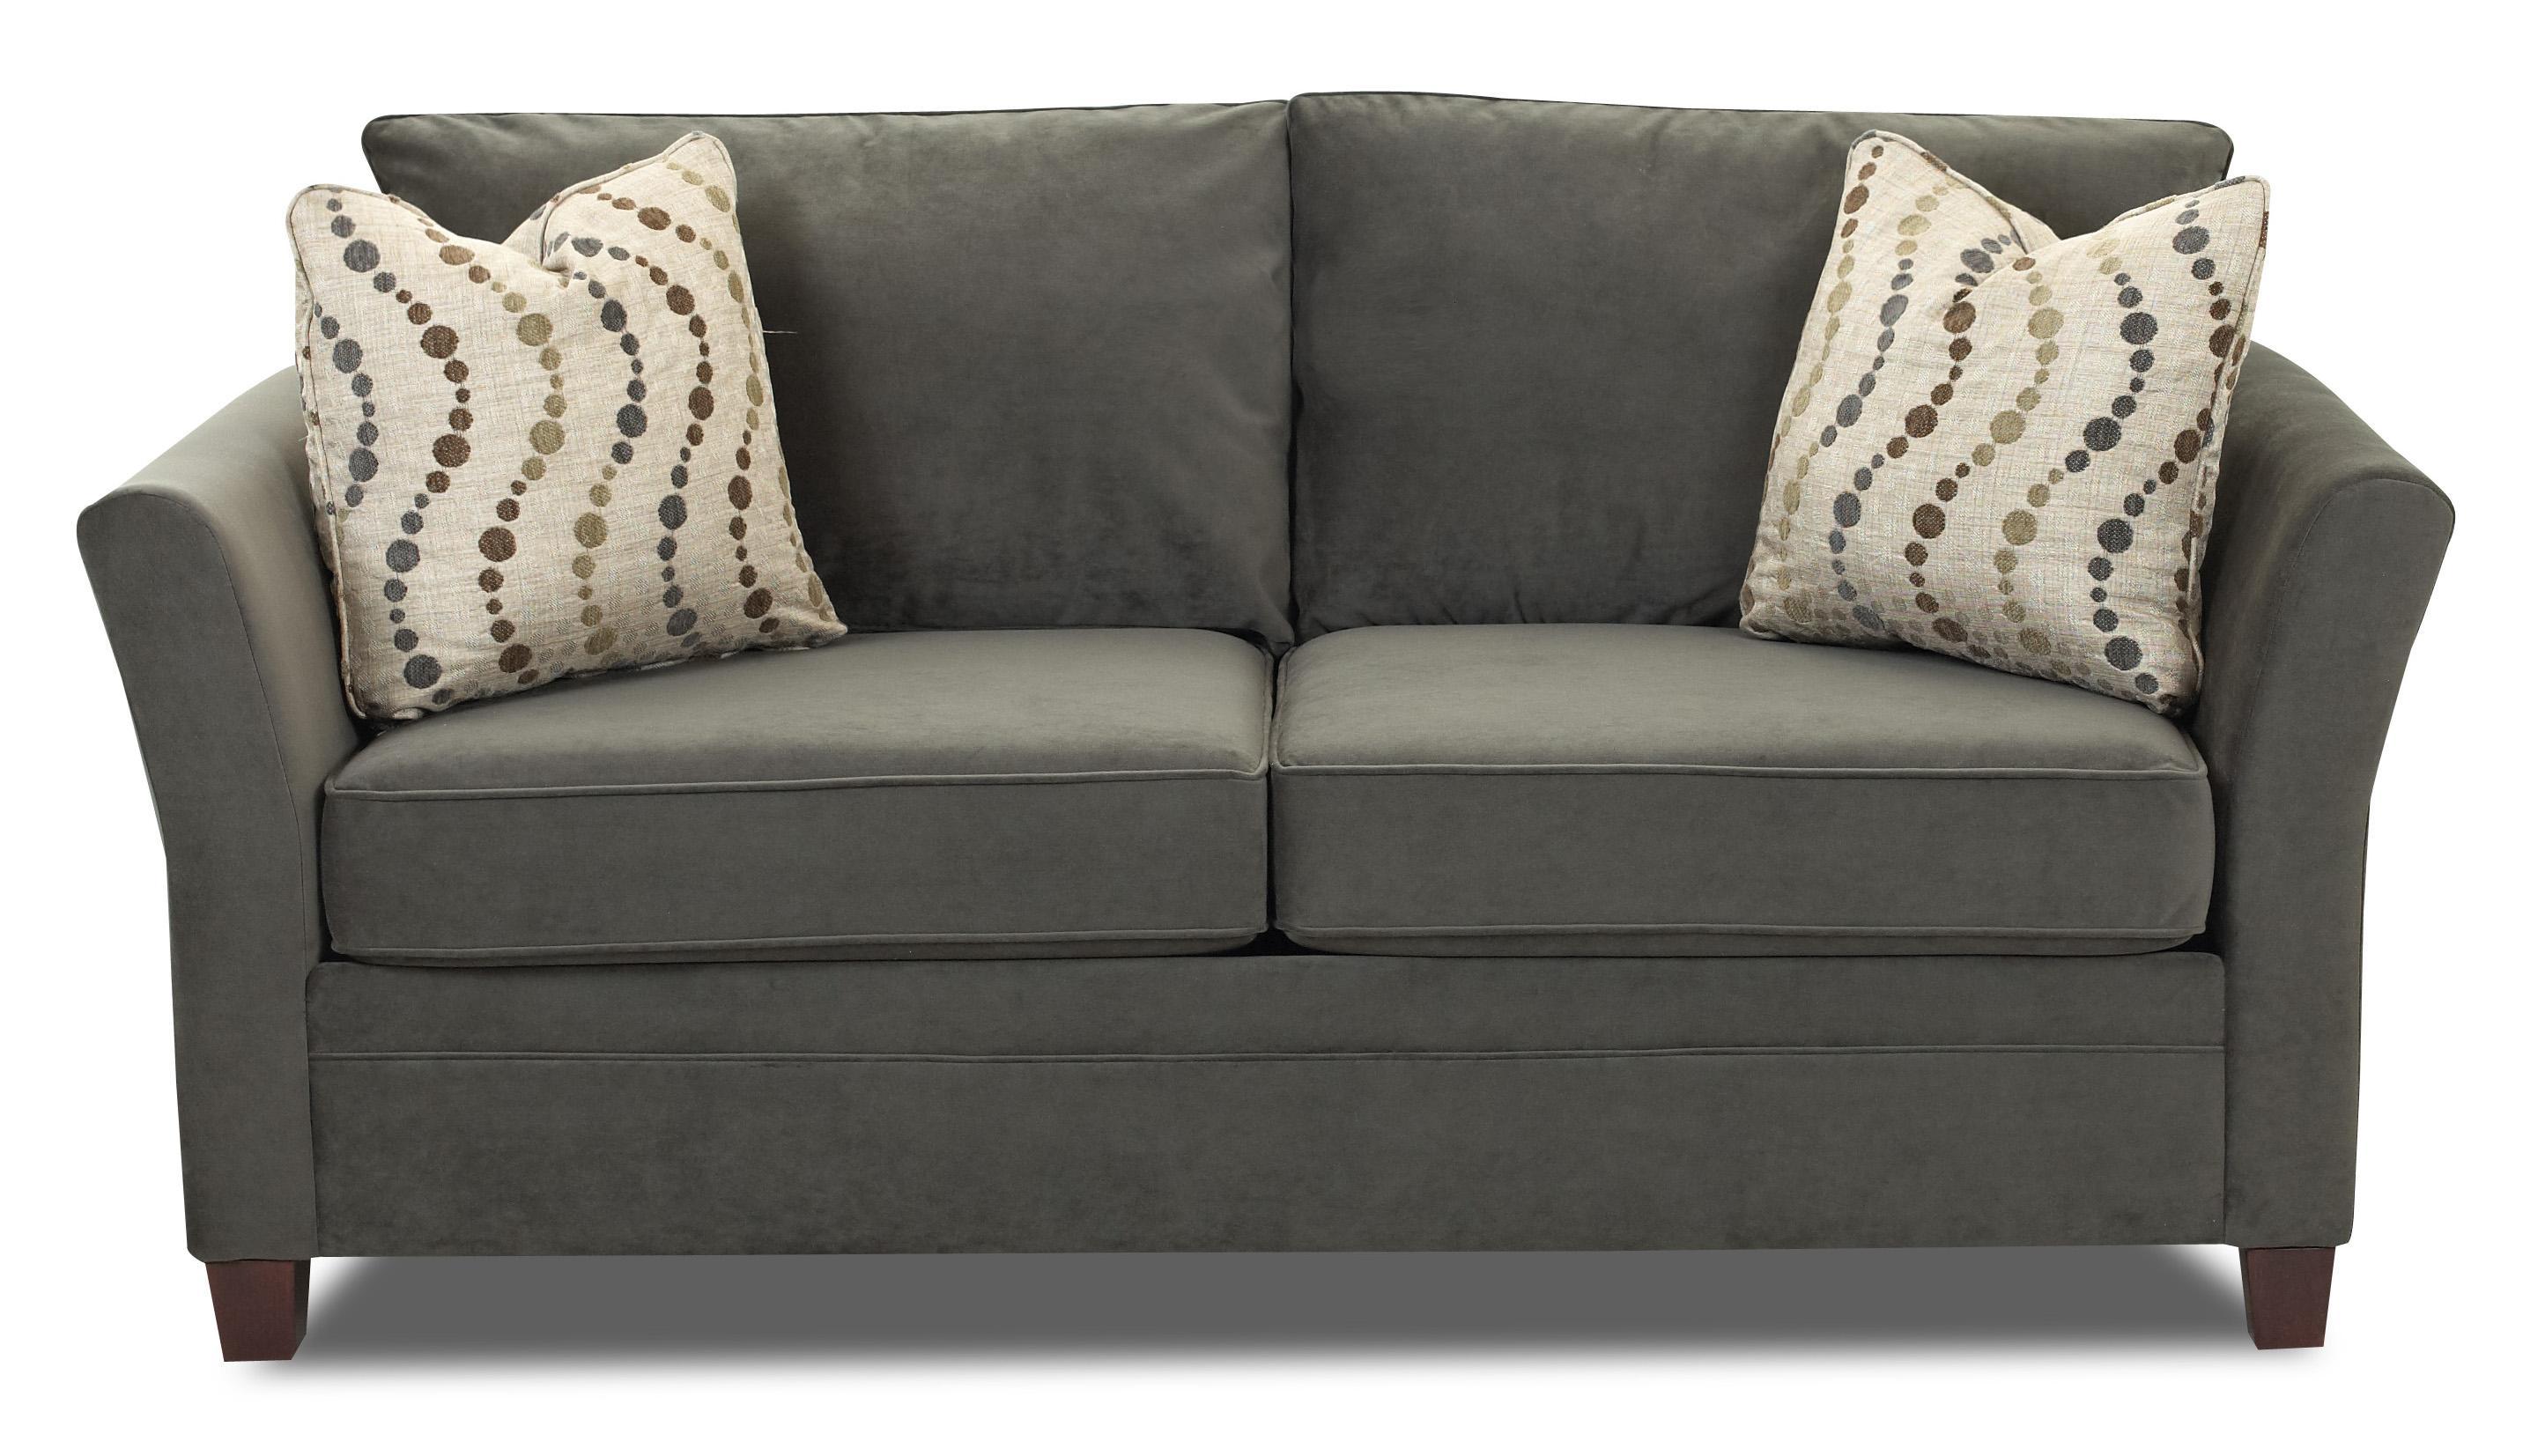 Klaussner Taylor Contemporary Studio Size Sofa